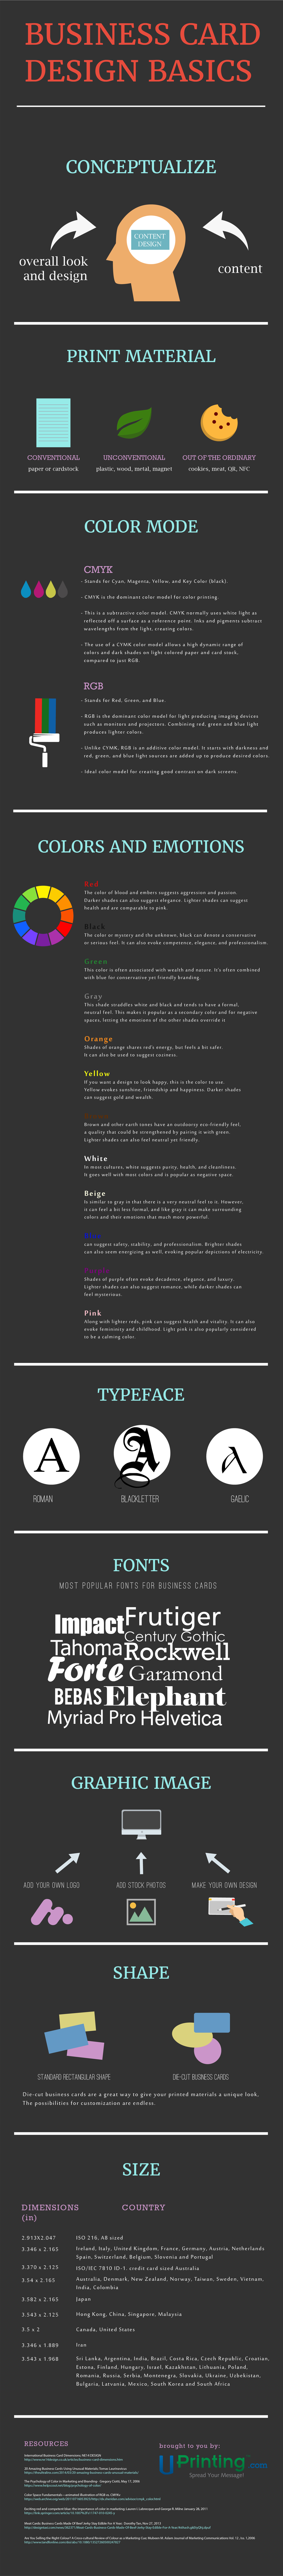 Business Card Design Basics Infographic